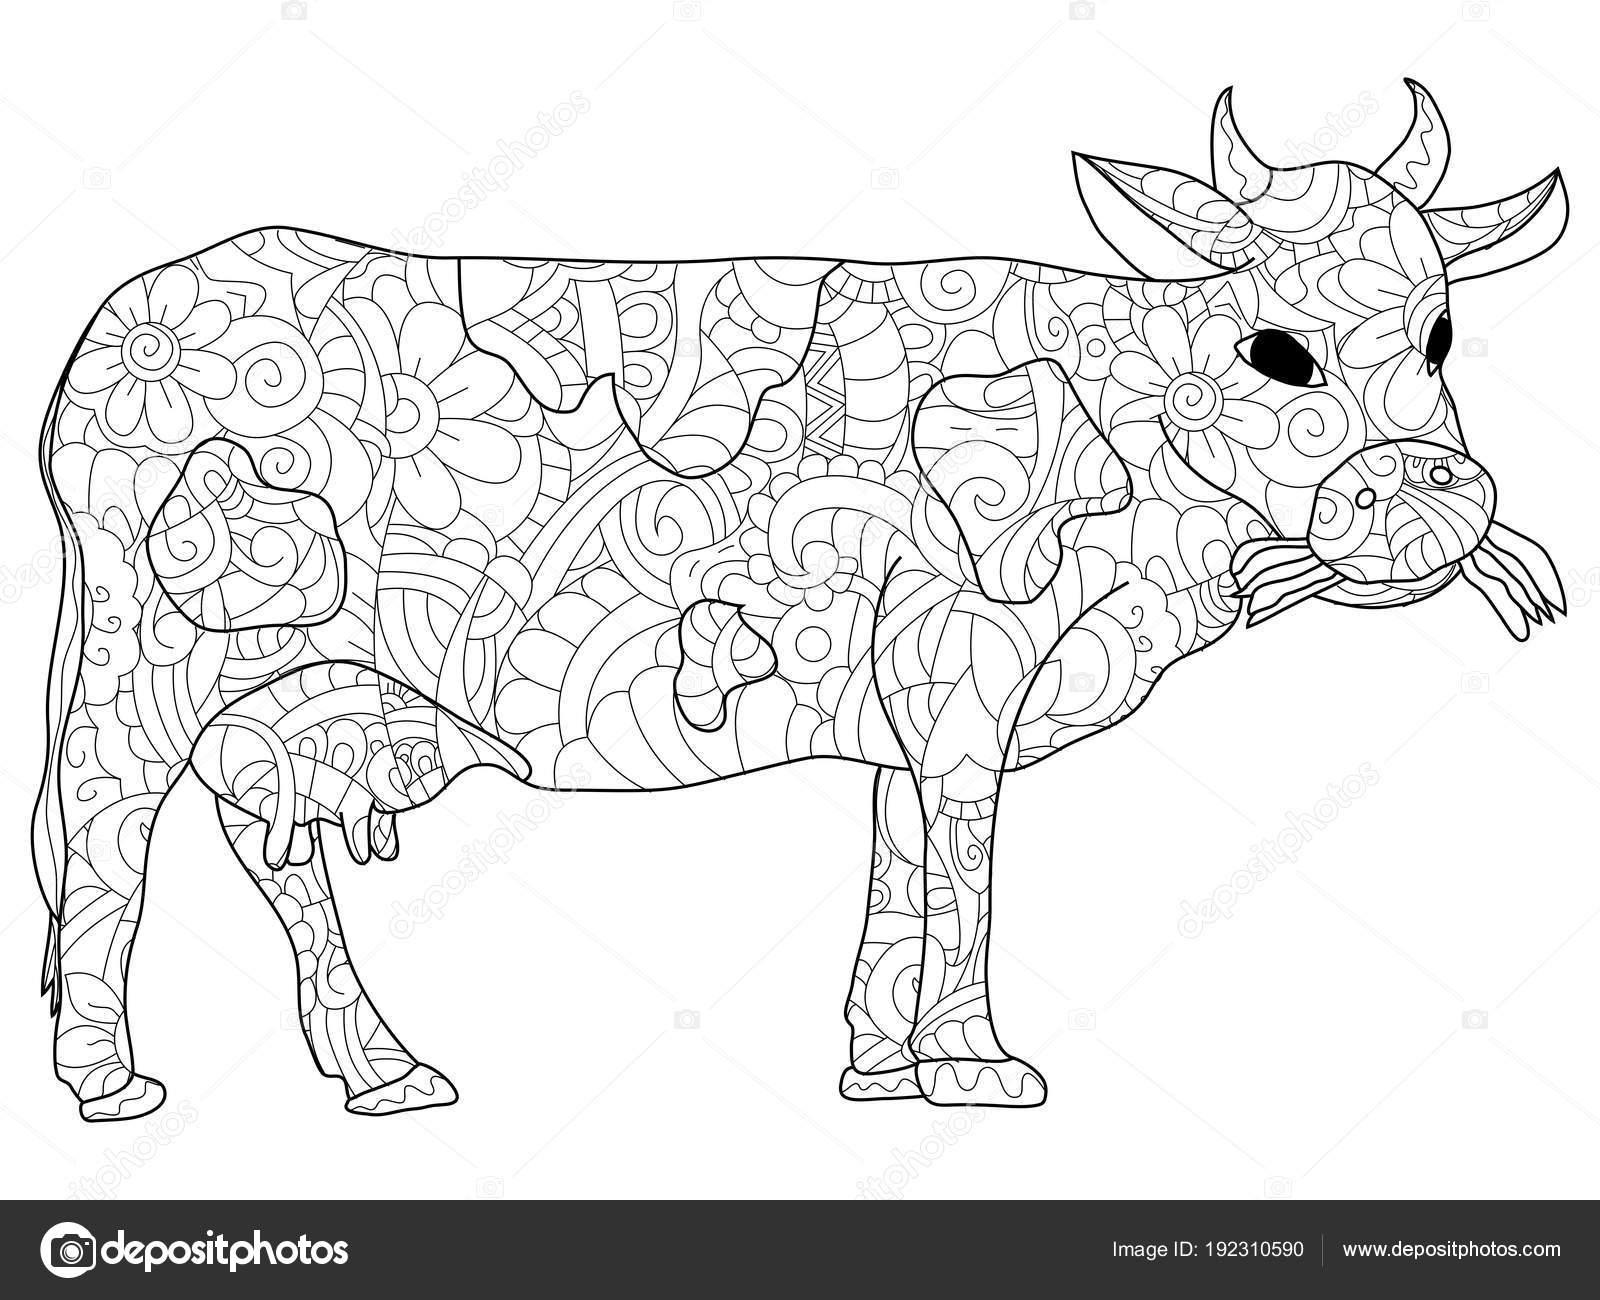 Kleurplaten Dieren Koeien.Volwassen Antistress Kleurplaten Dieren Koe Patroon Astrachan